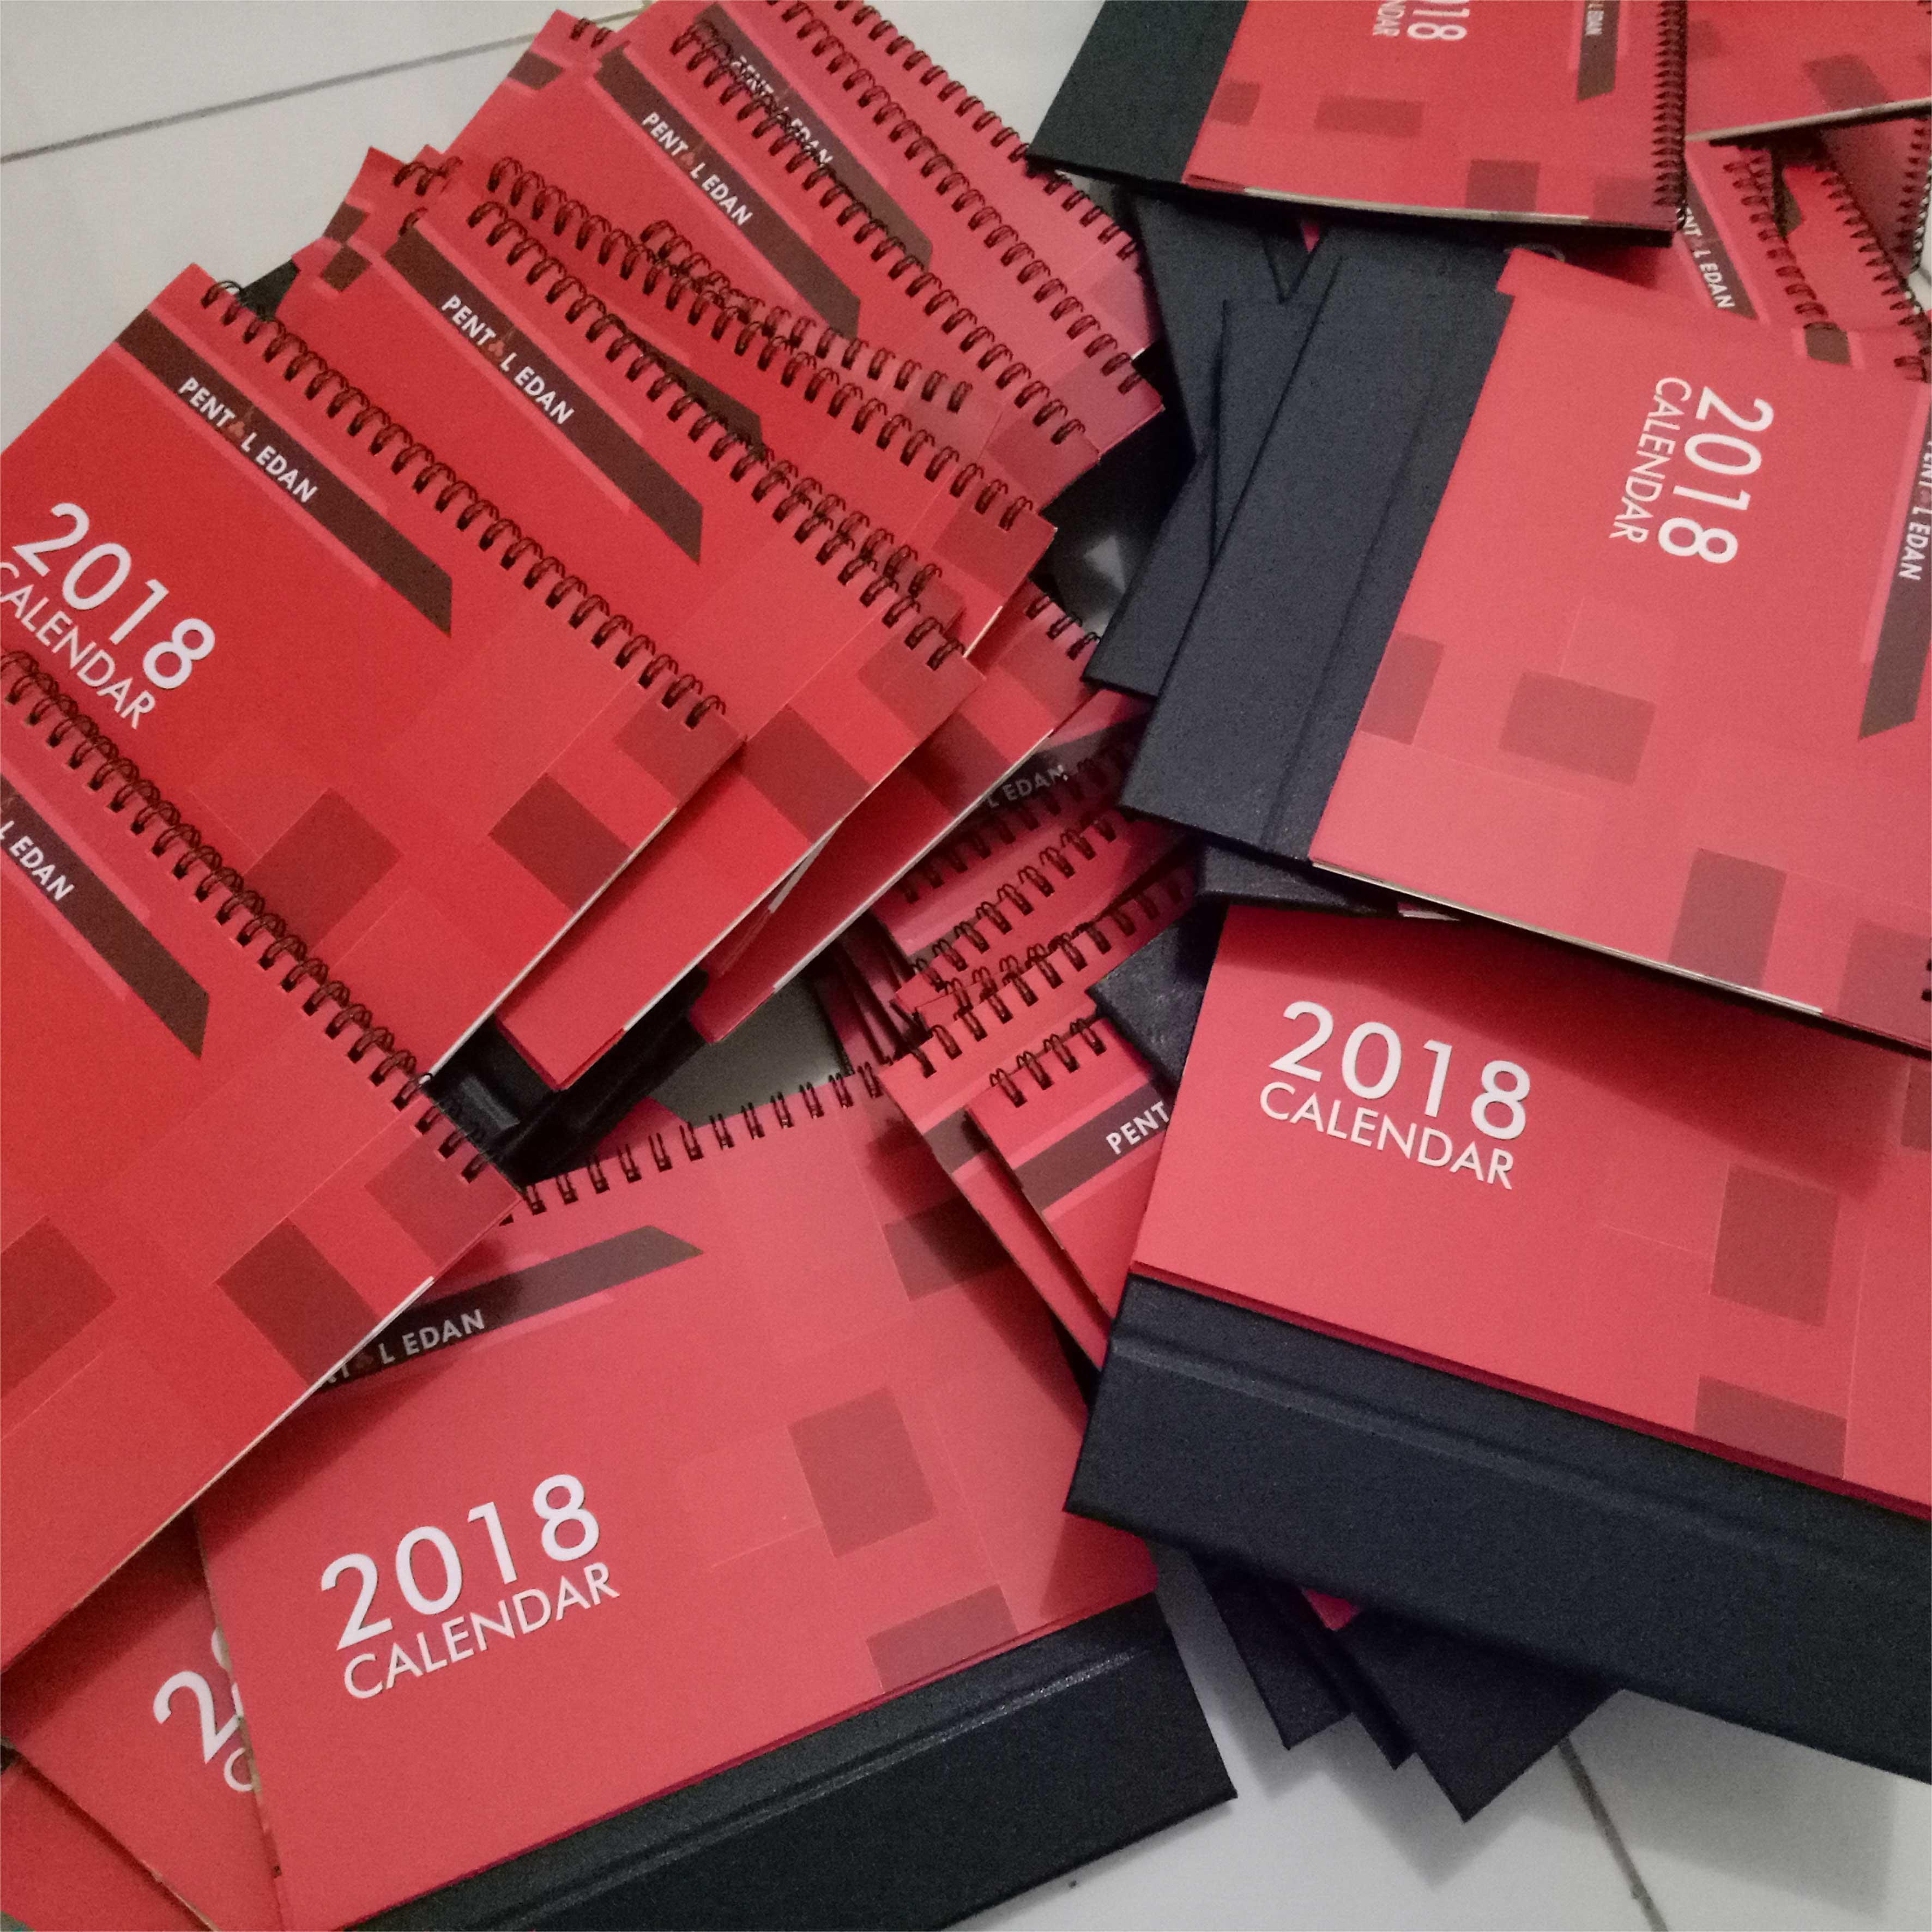 pesan cetak grosir kalender - jhesdesign.com